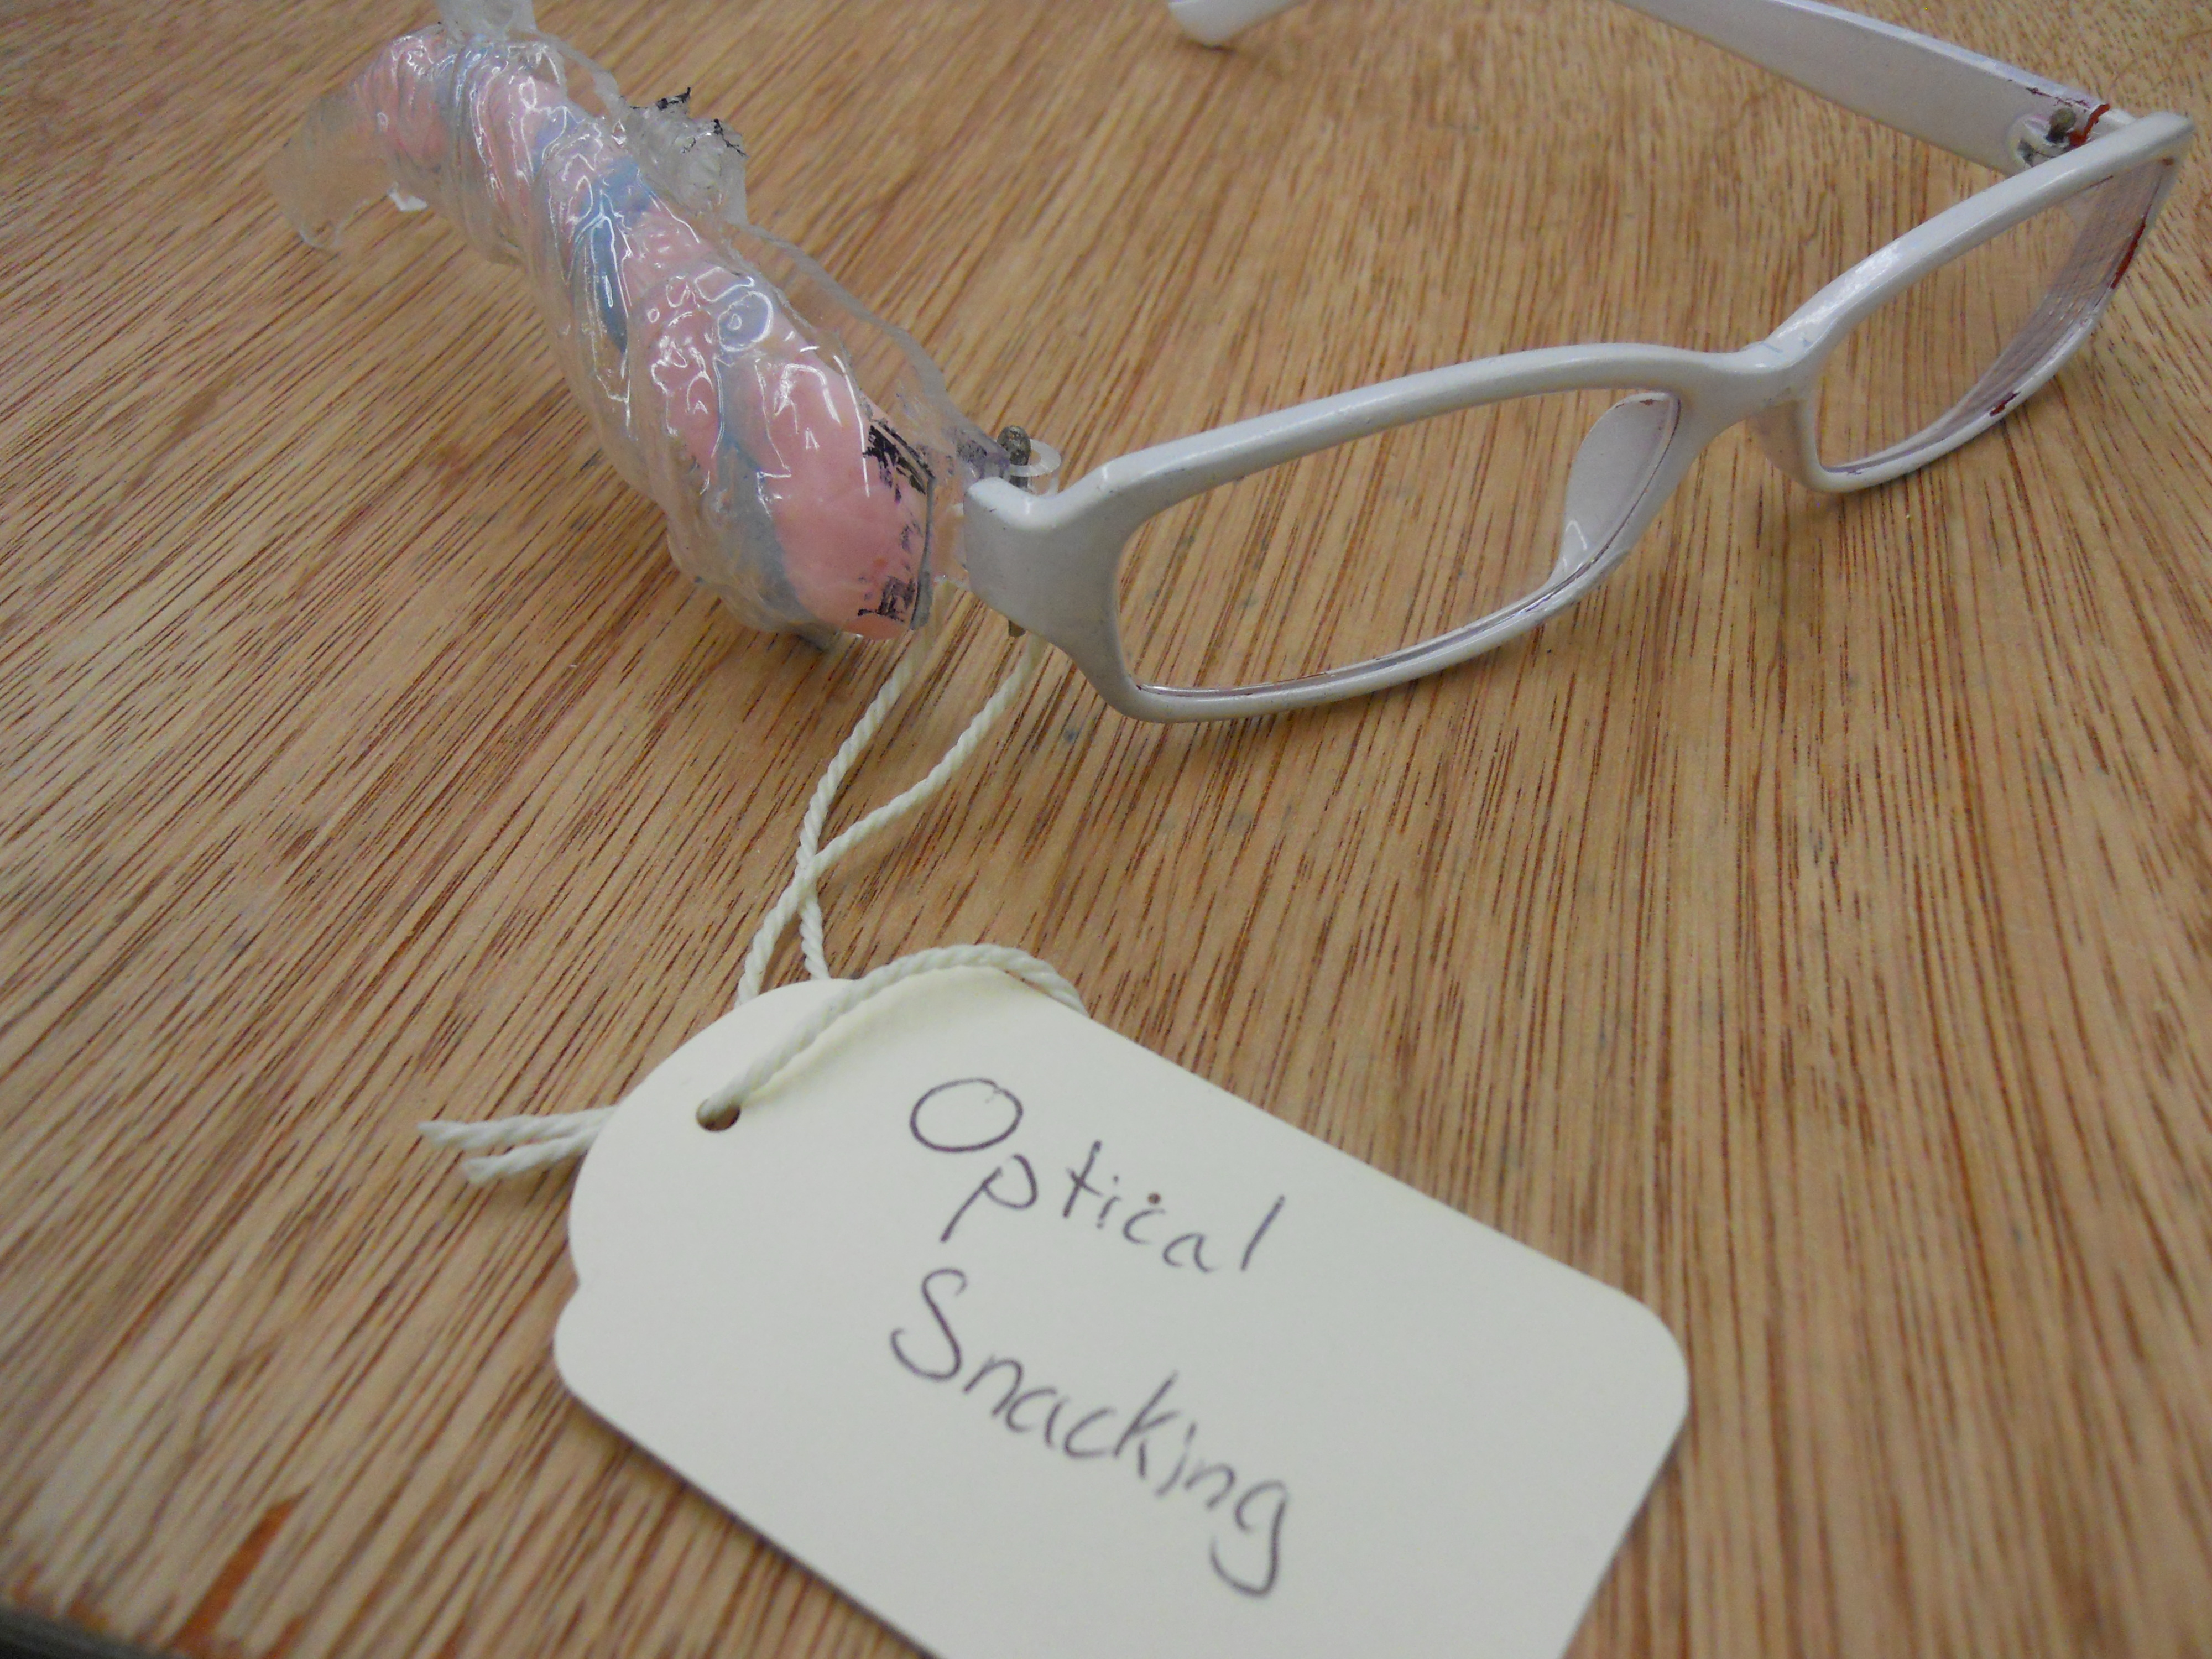 Optical Snacking